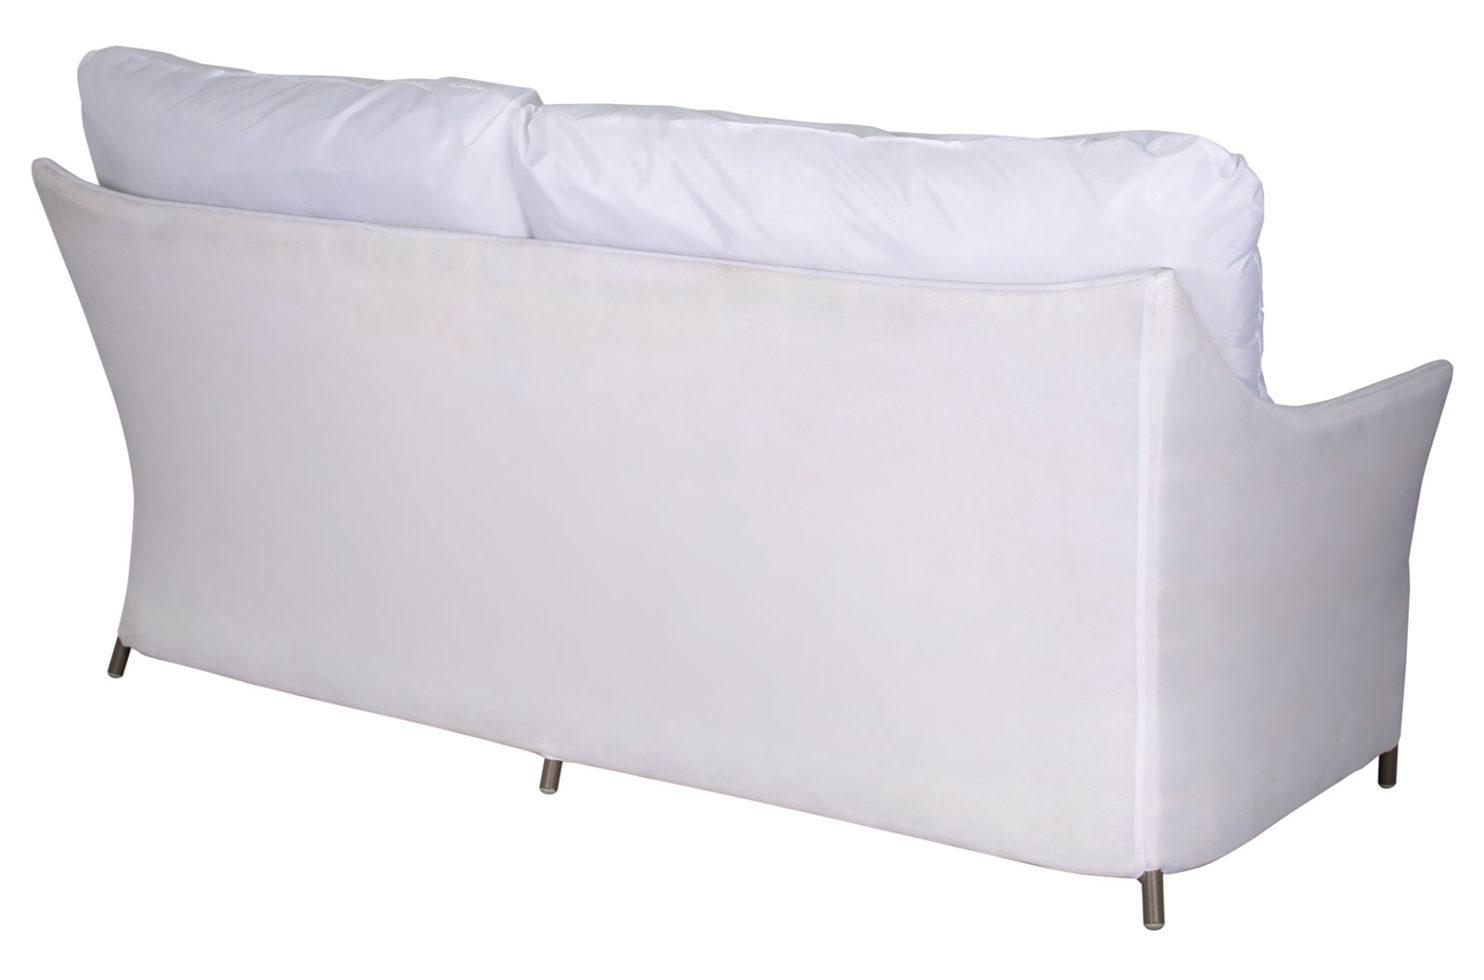 capri sofa frame 620FT094P2 1 3Q back